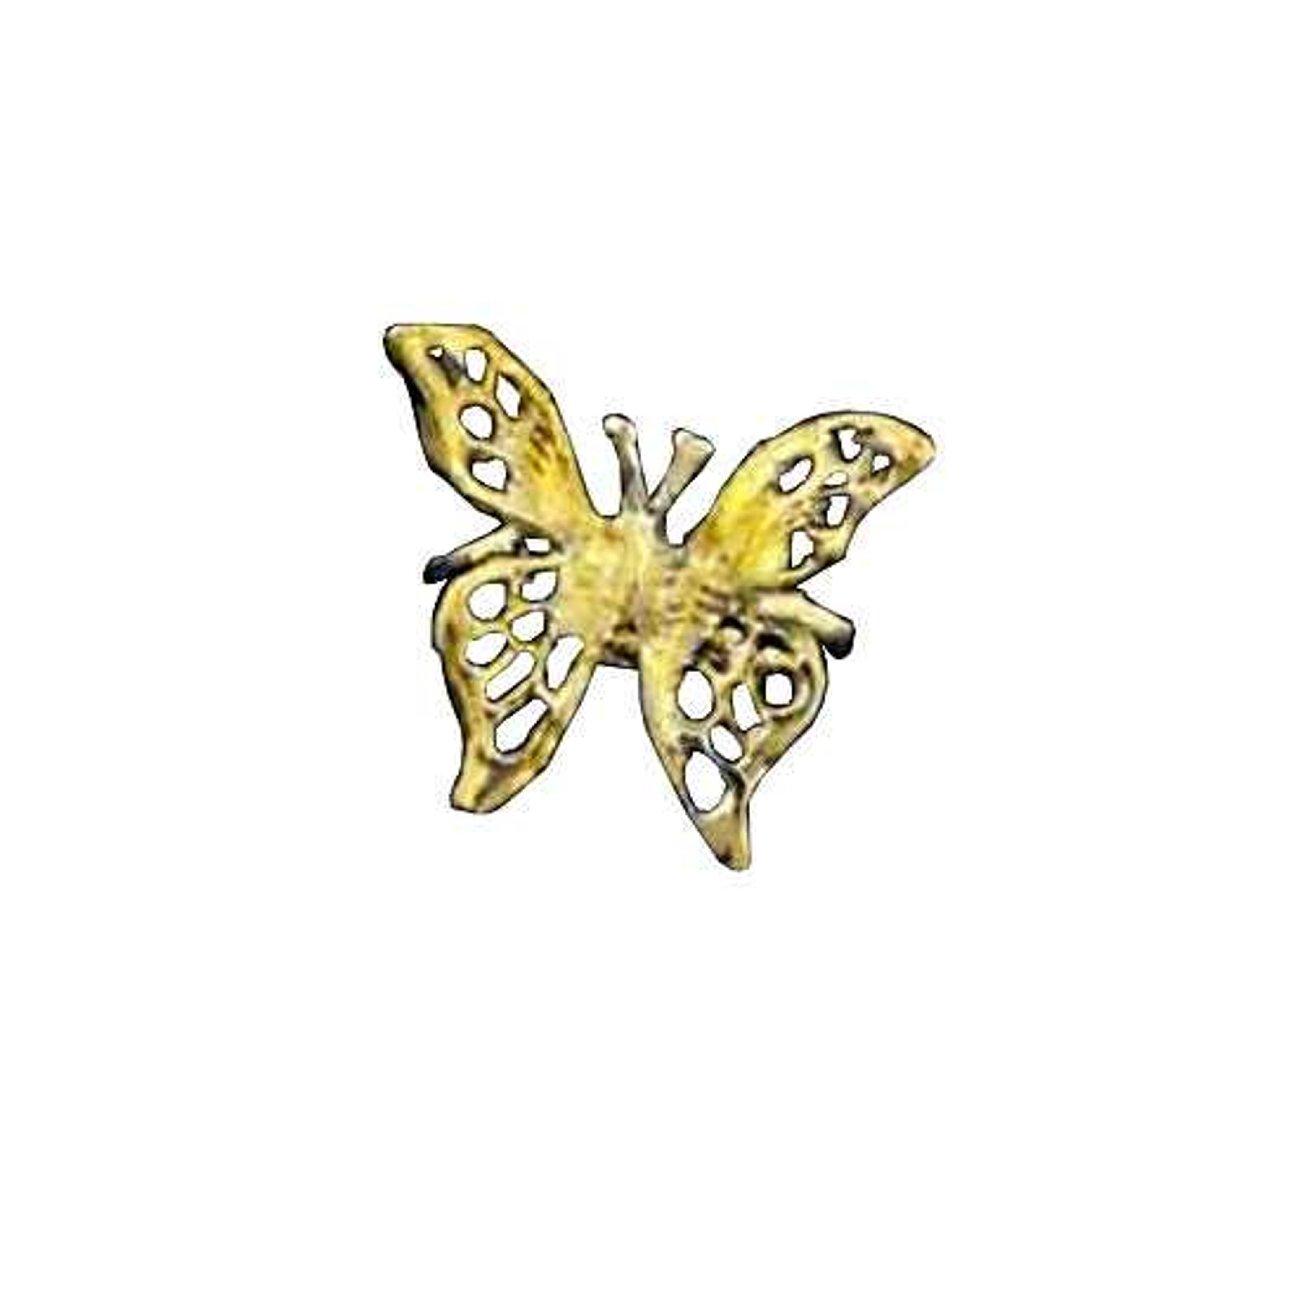 Gold Vermeil Left Only Pierceless 3D Open Butterfly Ear Cuff Wrap